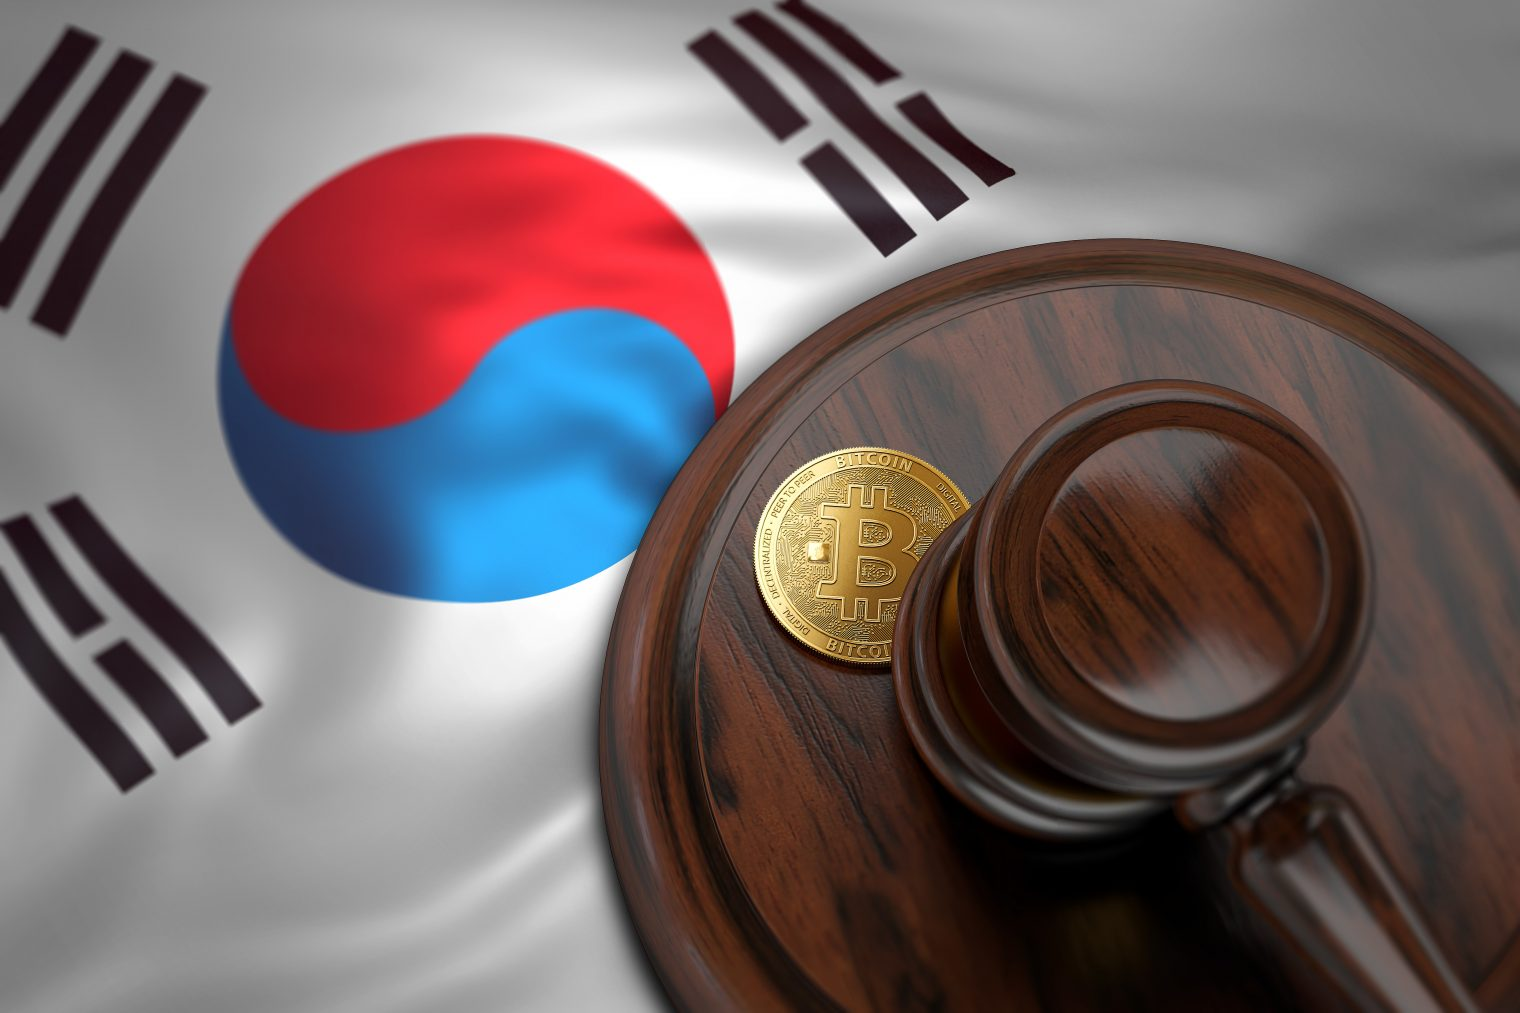 bitcoin-corea del sur-criptomonedas